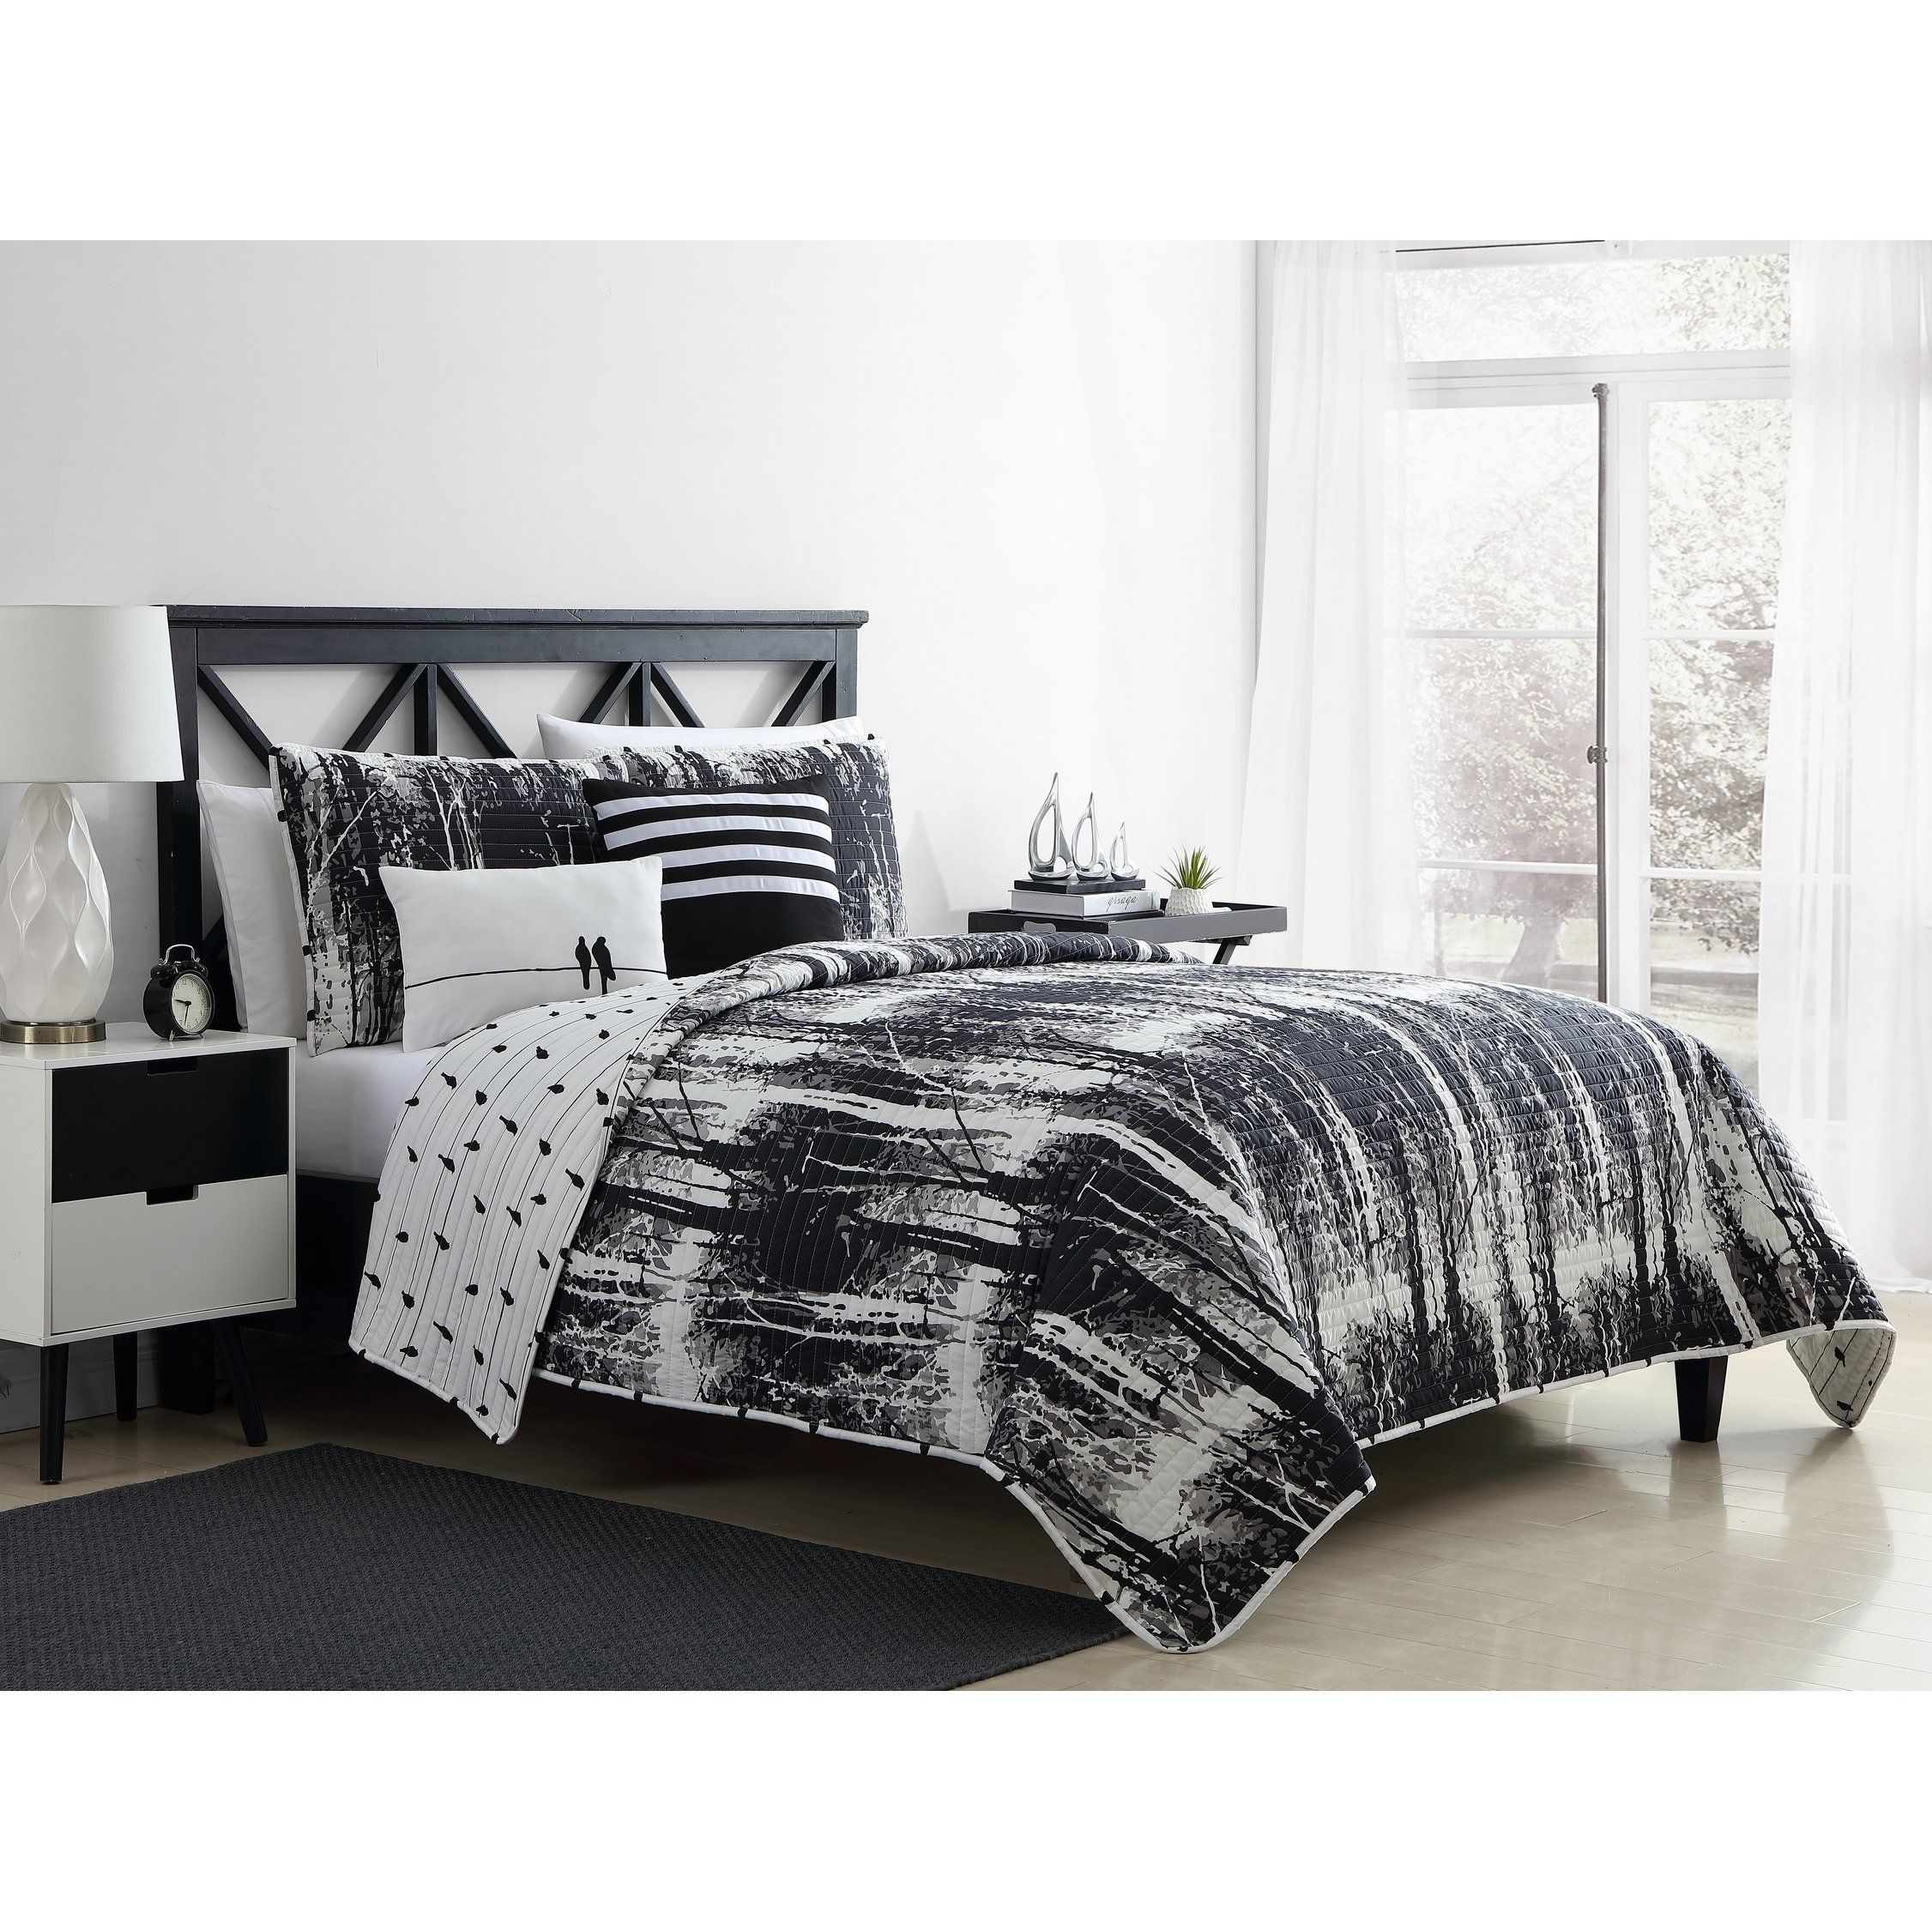 Vcny Home Woodland Reversible Quilt Set King 5 Piece Black Duvet Cover Sets White Duvet Covers White Duvet